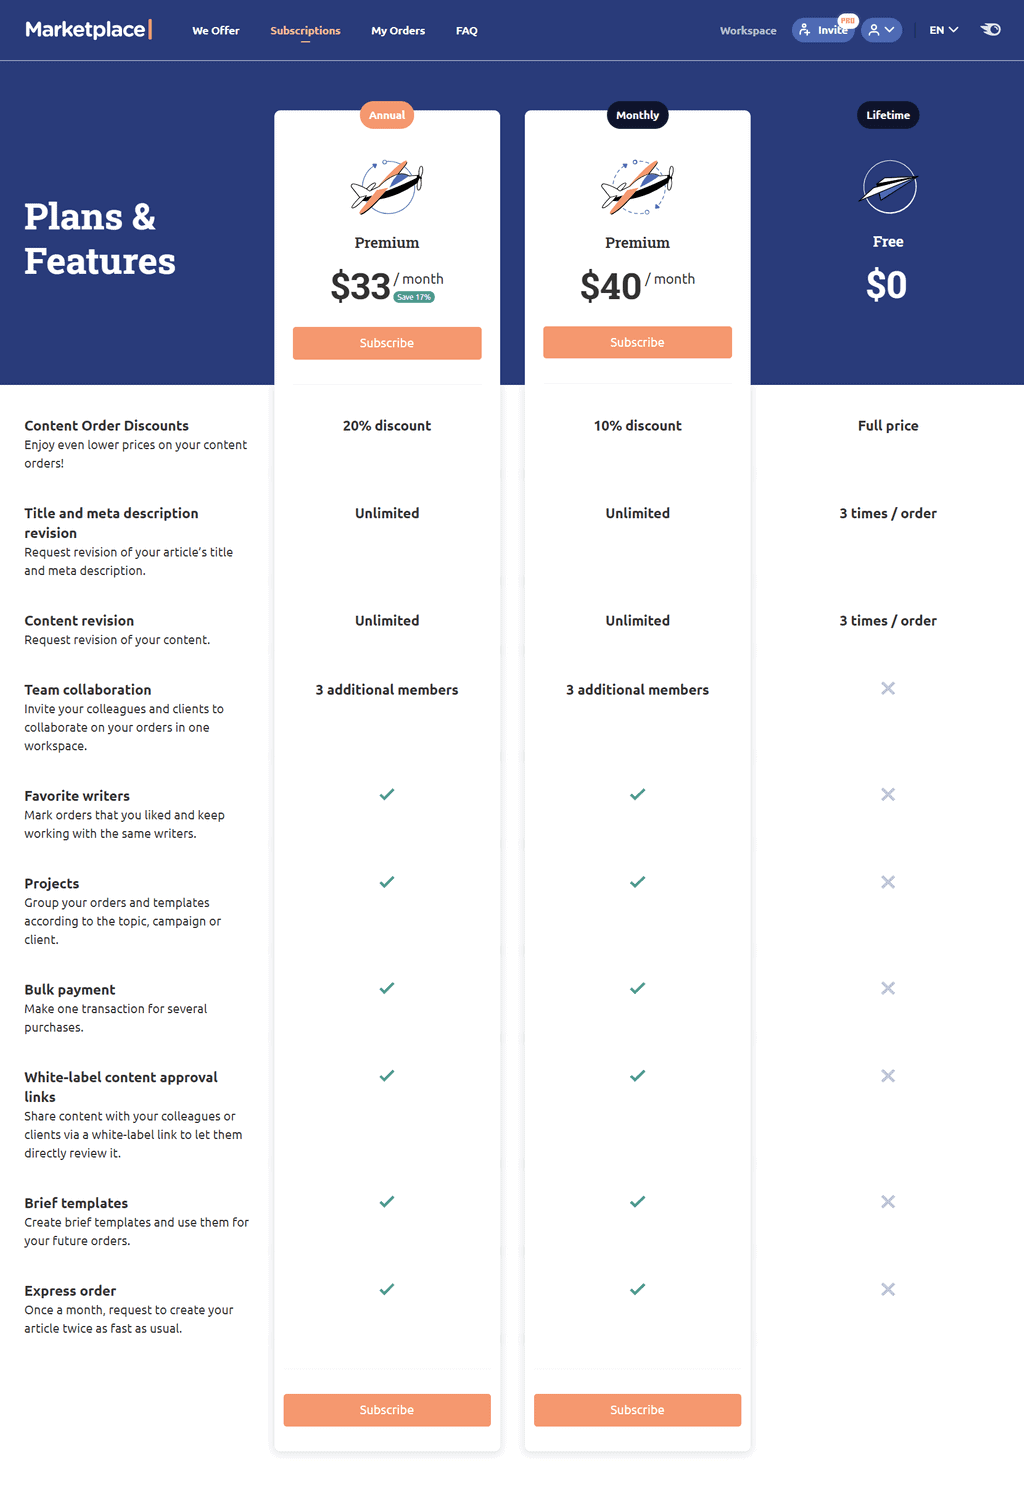 Semrush Marketplace Subscription